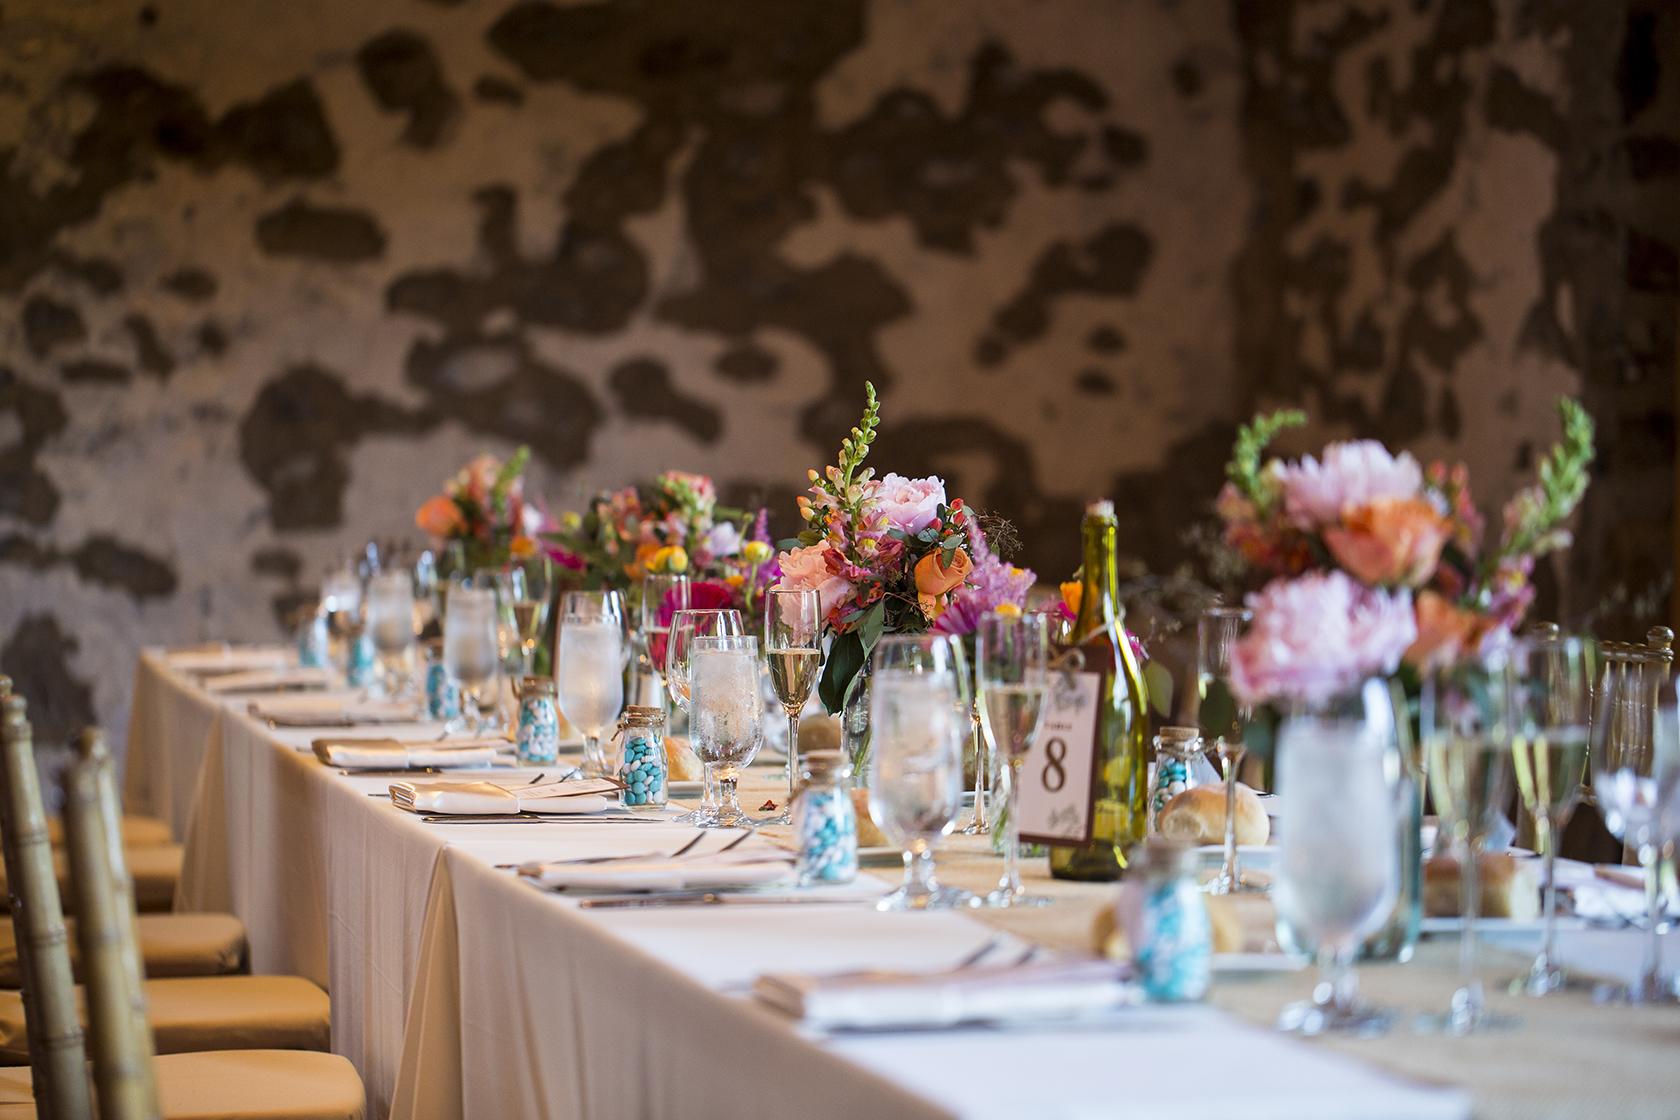 Wedding Flower Arrangements In Mason Jars On Long Tables